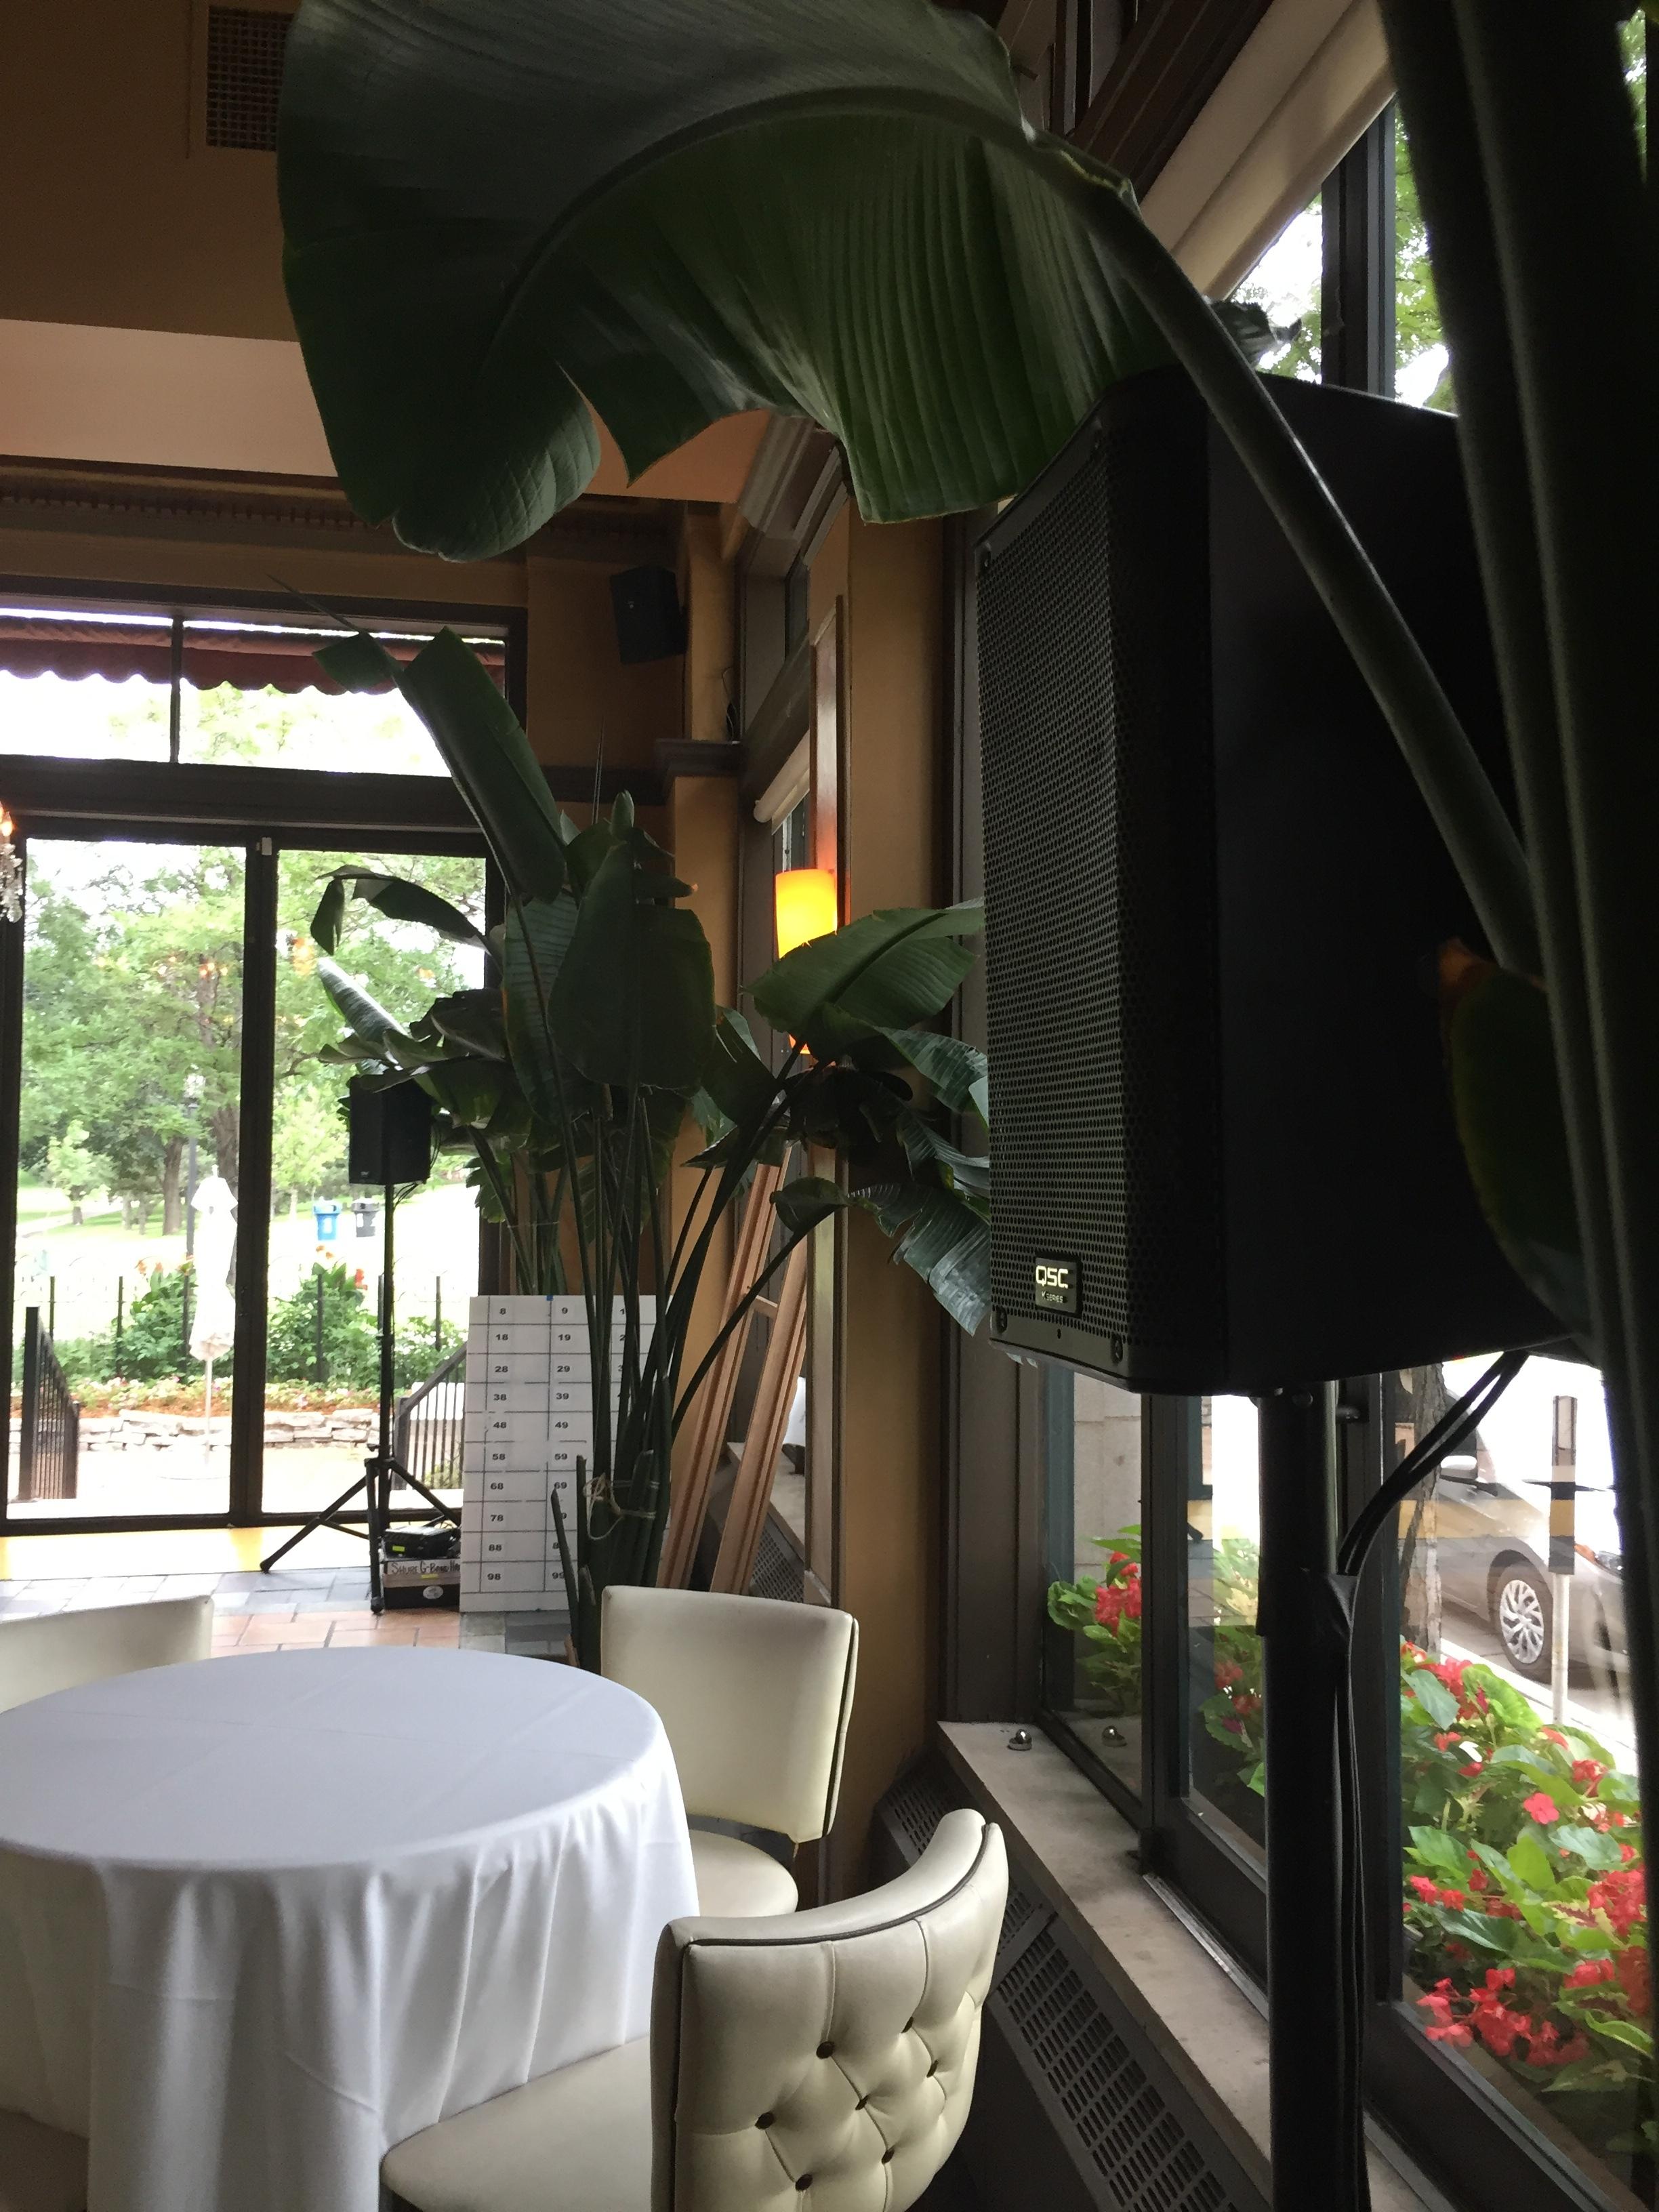 Picture of AV for You speaker rental at Cafe Lurcat in Minneapolis